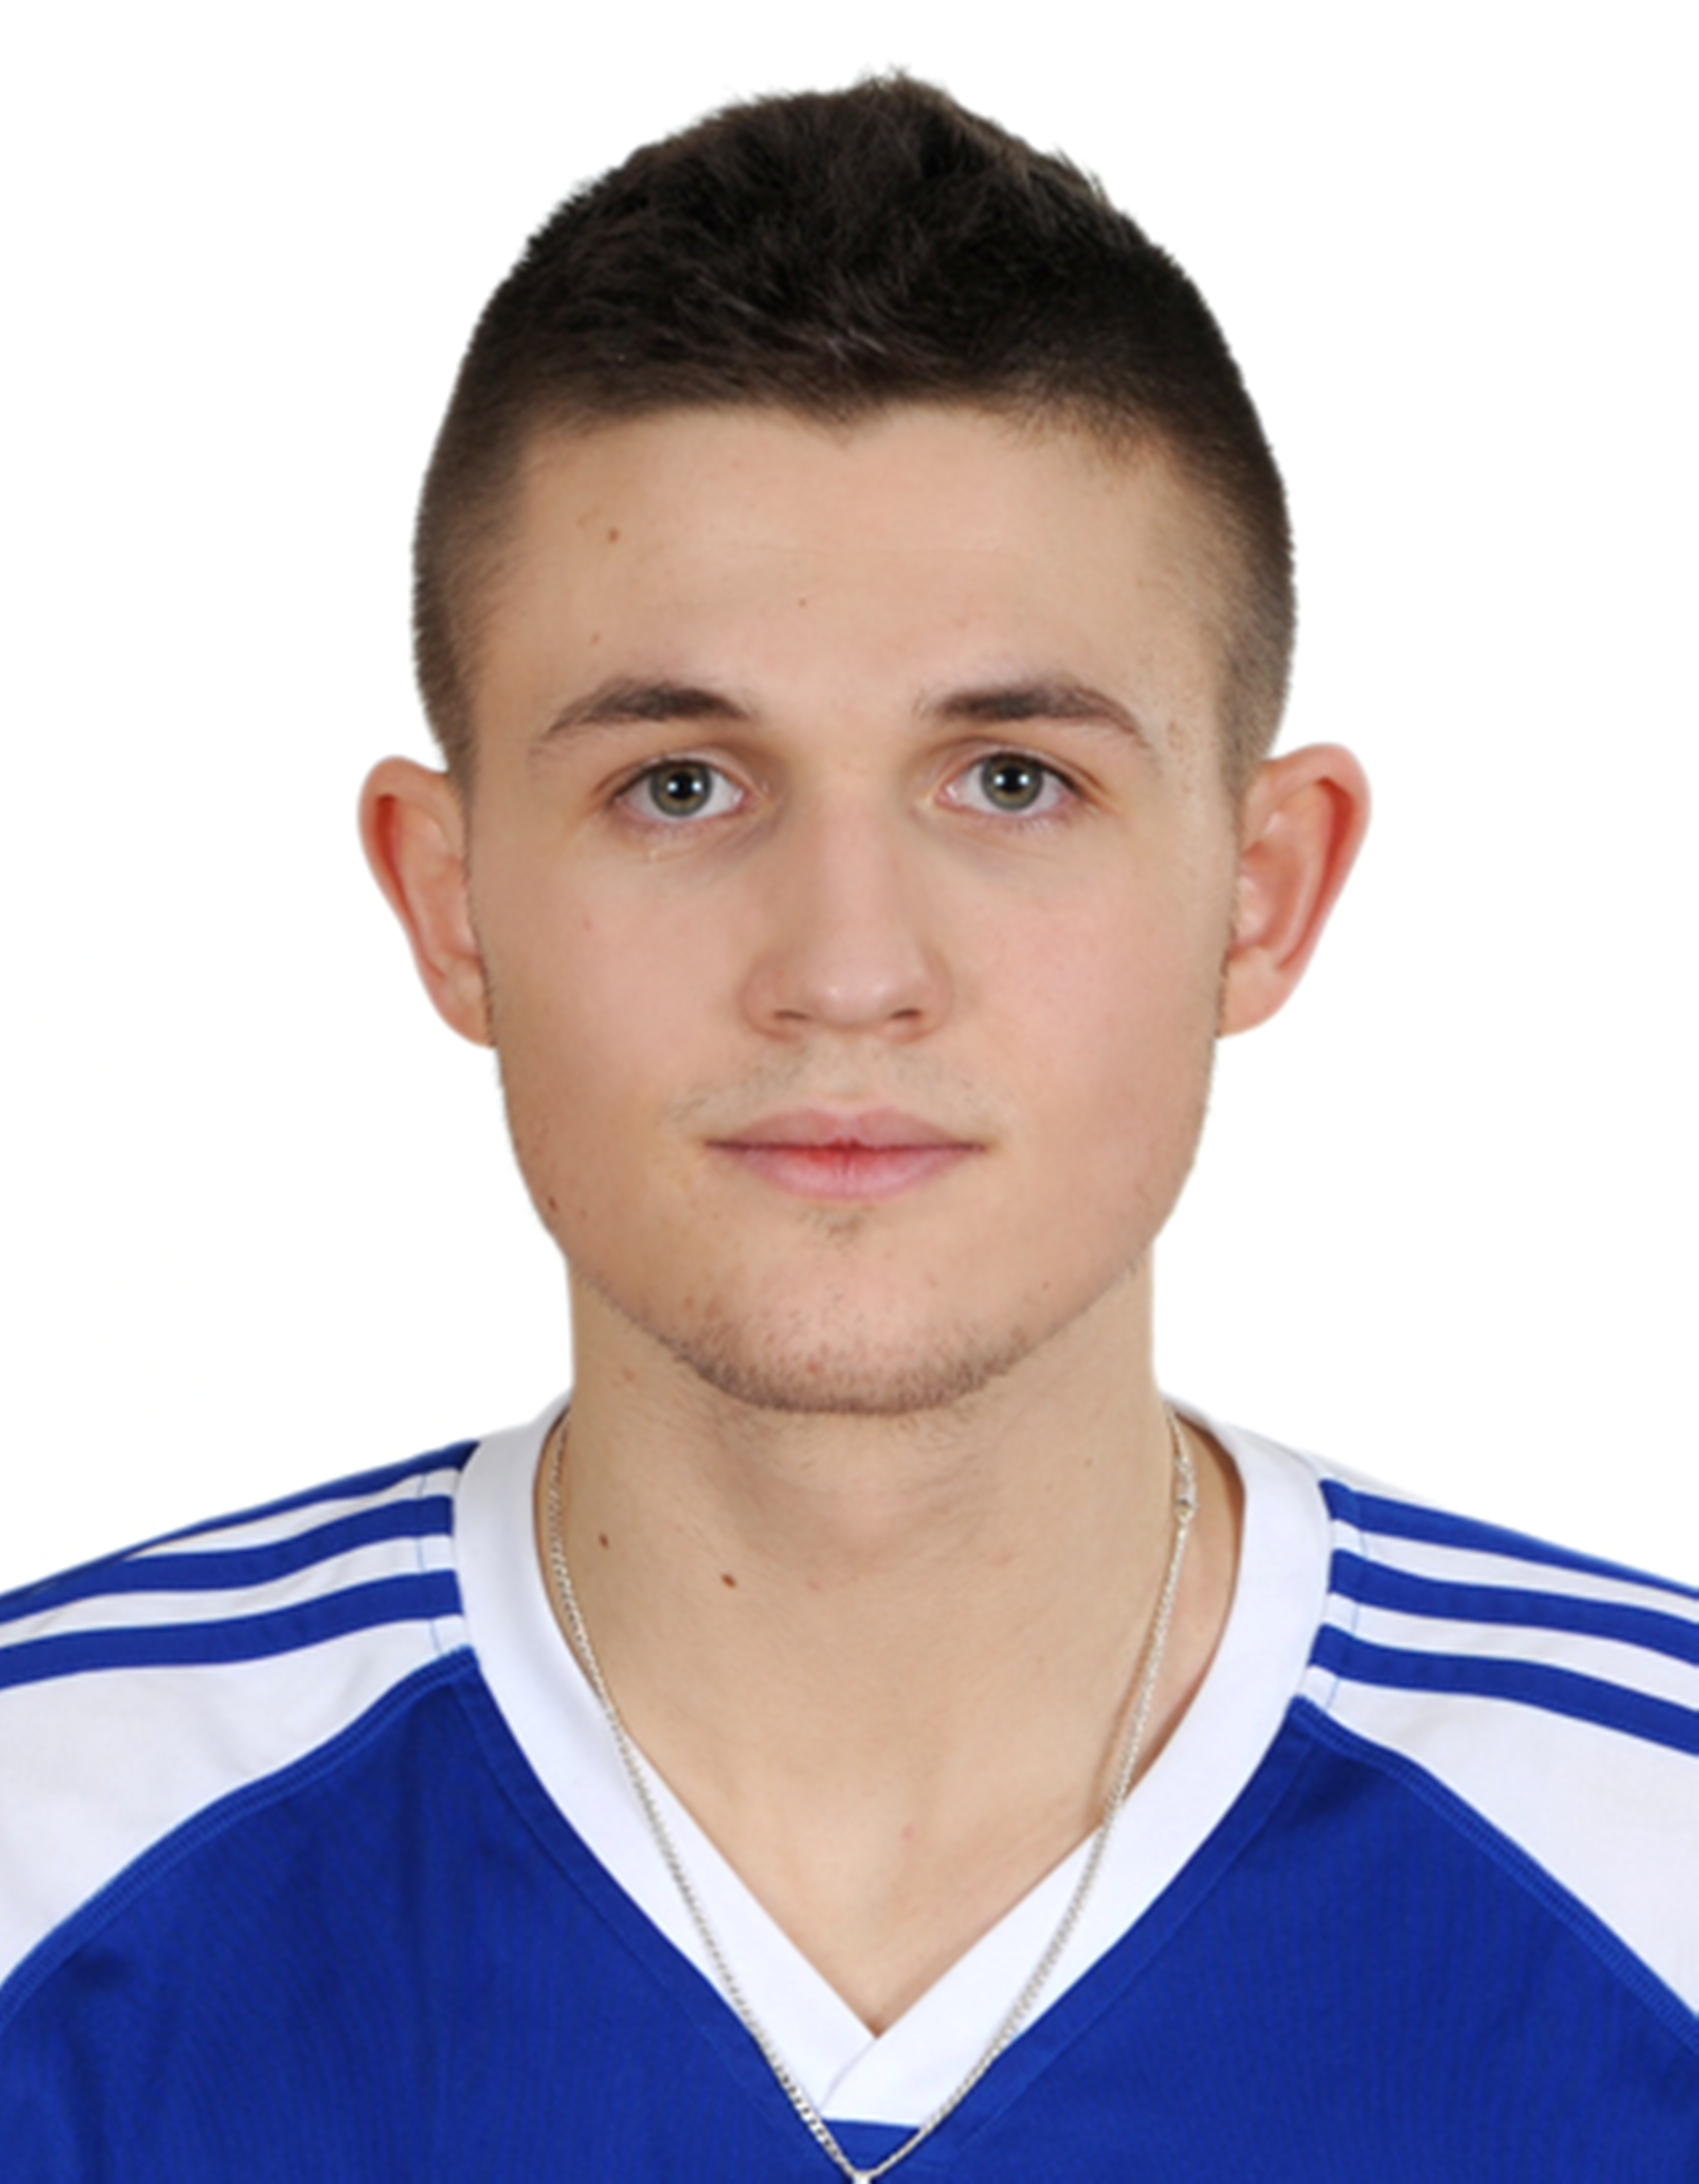 Mateusz Maslowski